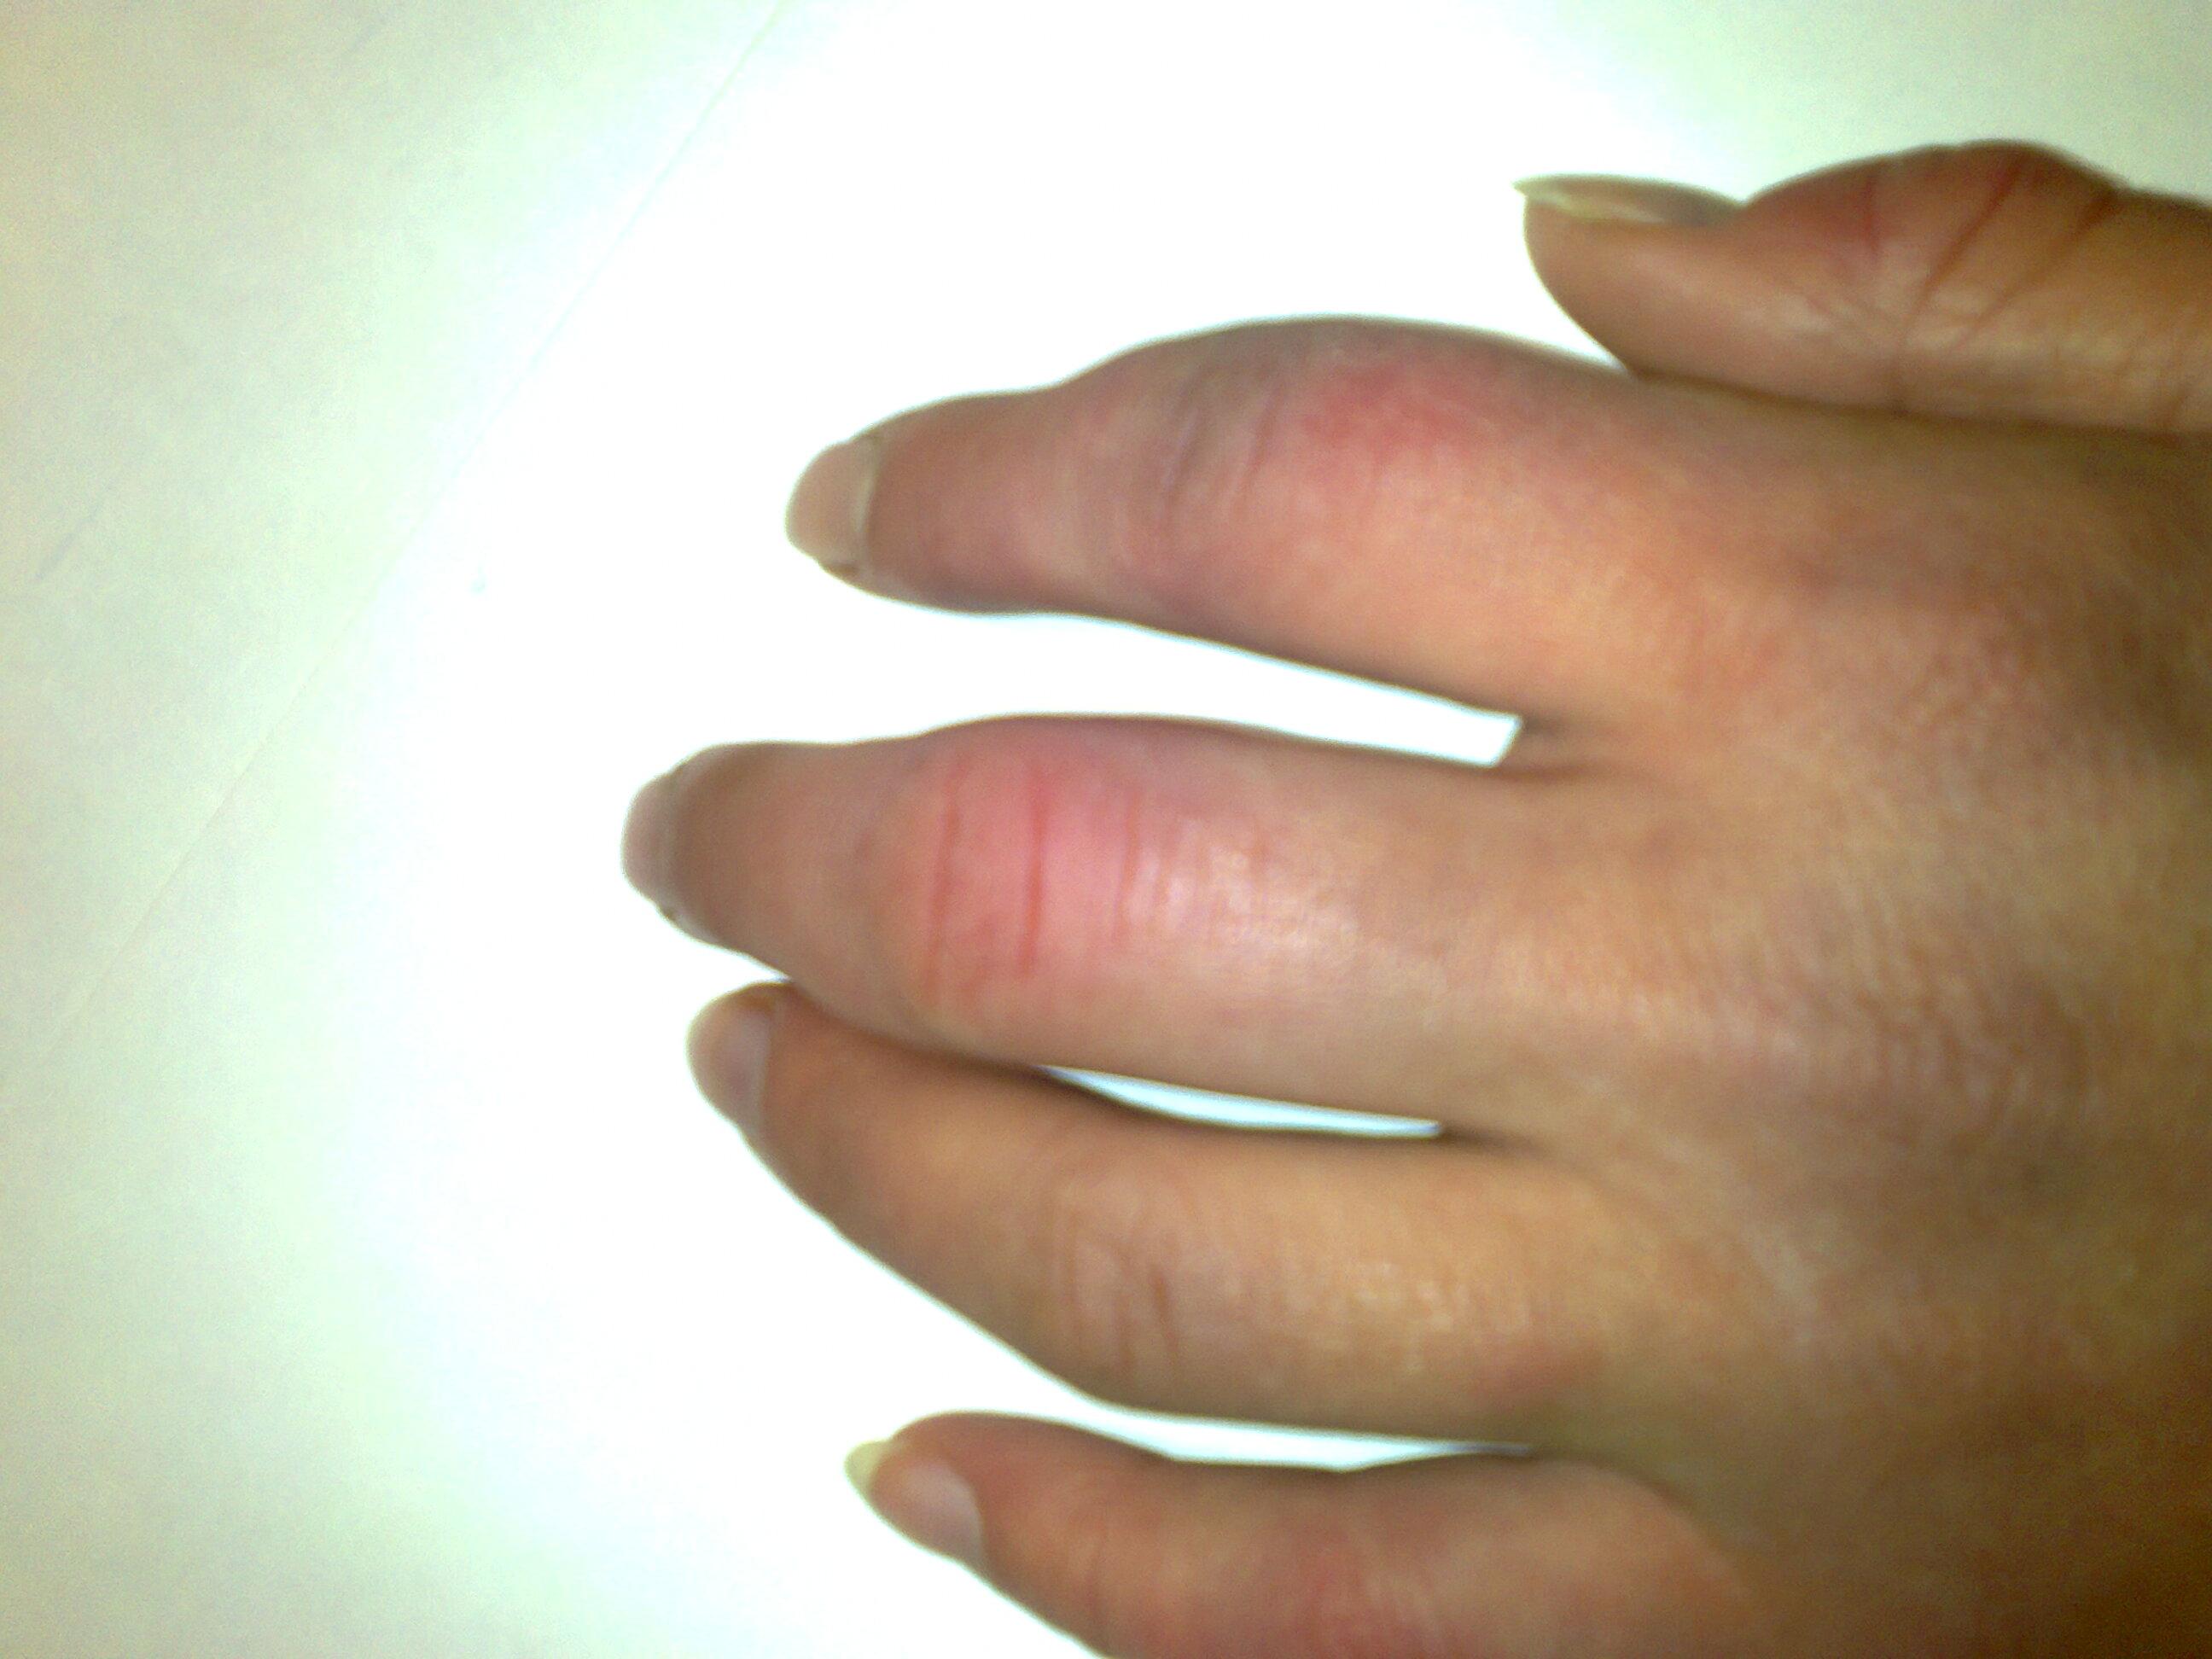 Опухла рука как лечить в домашних условиях 457